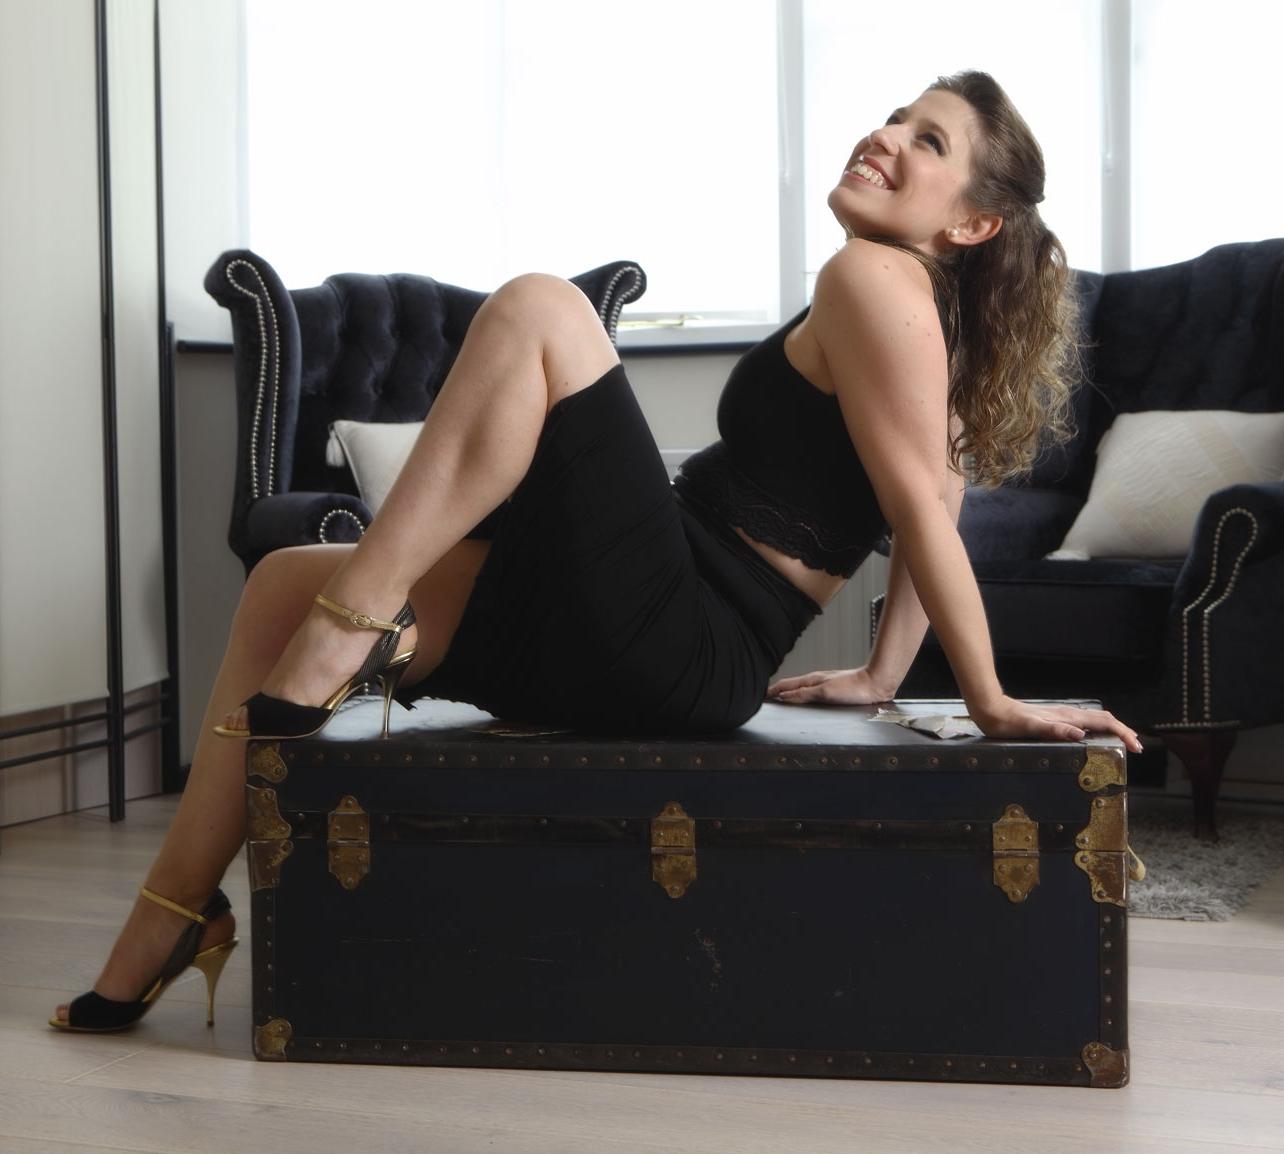 Stefania Colina wearing Yuyo Brujo shoes (Al Verla Pasar) - click to shop